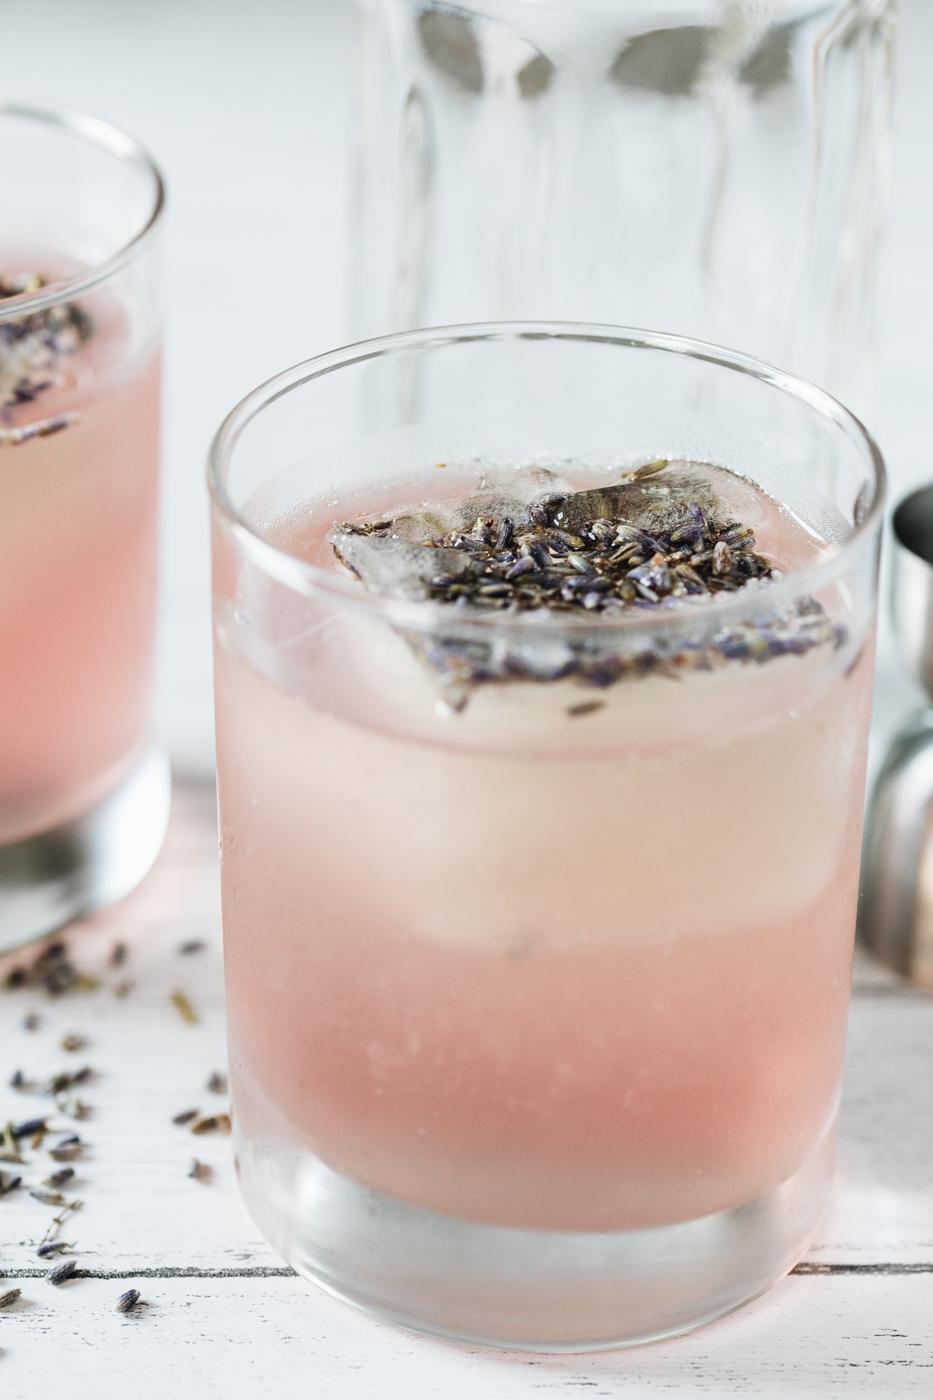 vodka cocktails, finlandia vodka, lavender simple syrup, lavender cocktails, the kentucky gent